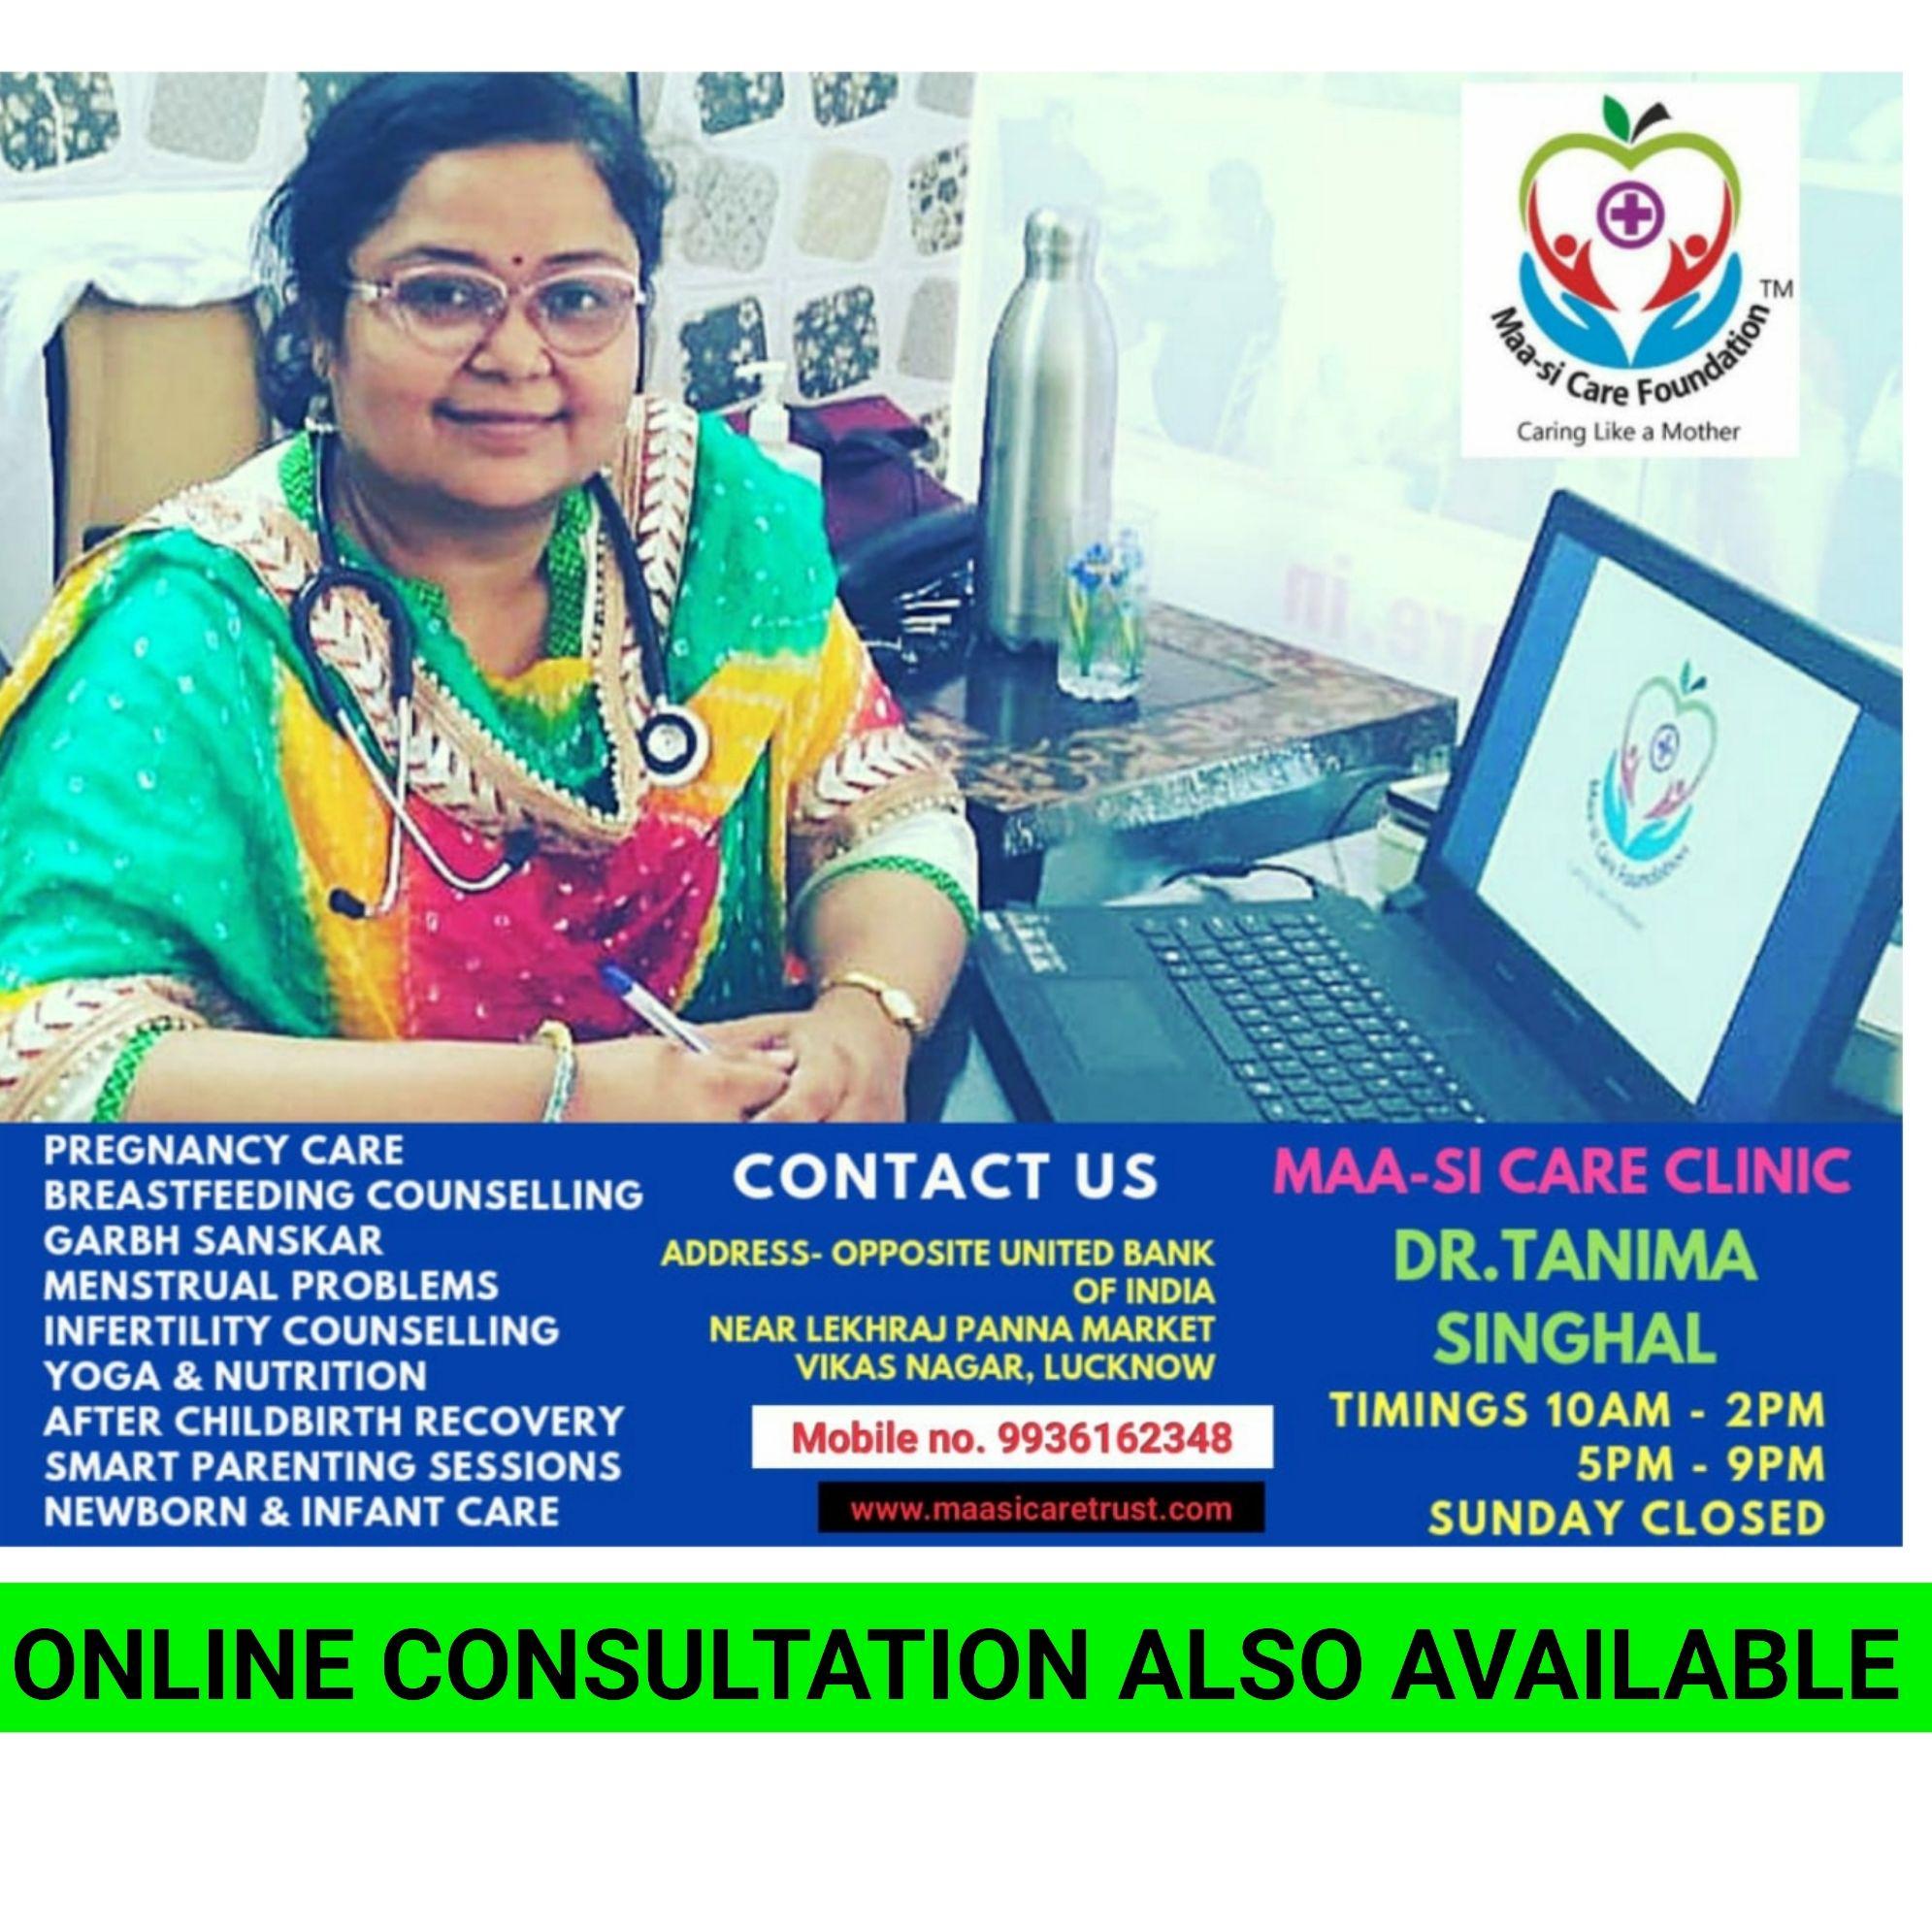 Dr Tanima Singhal